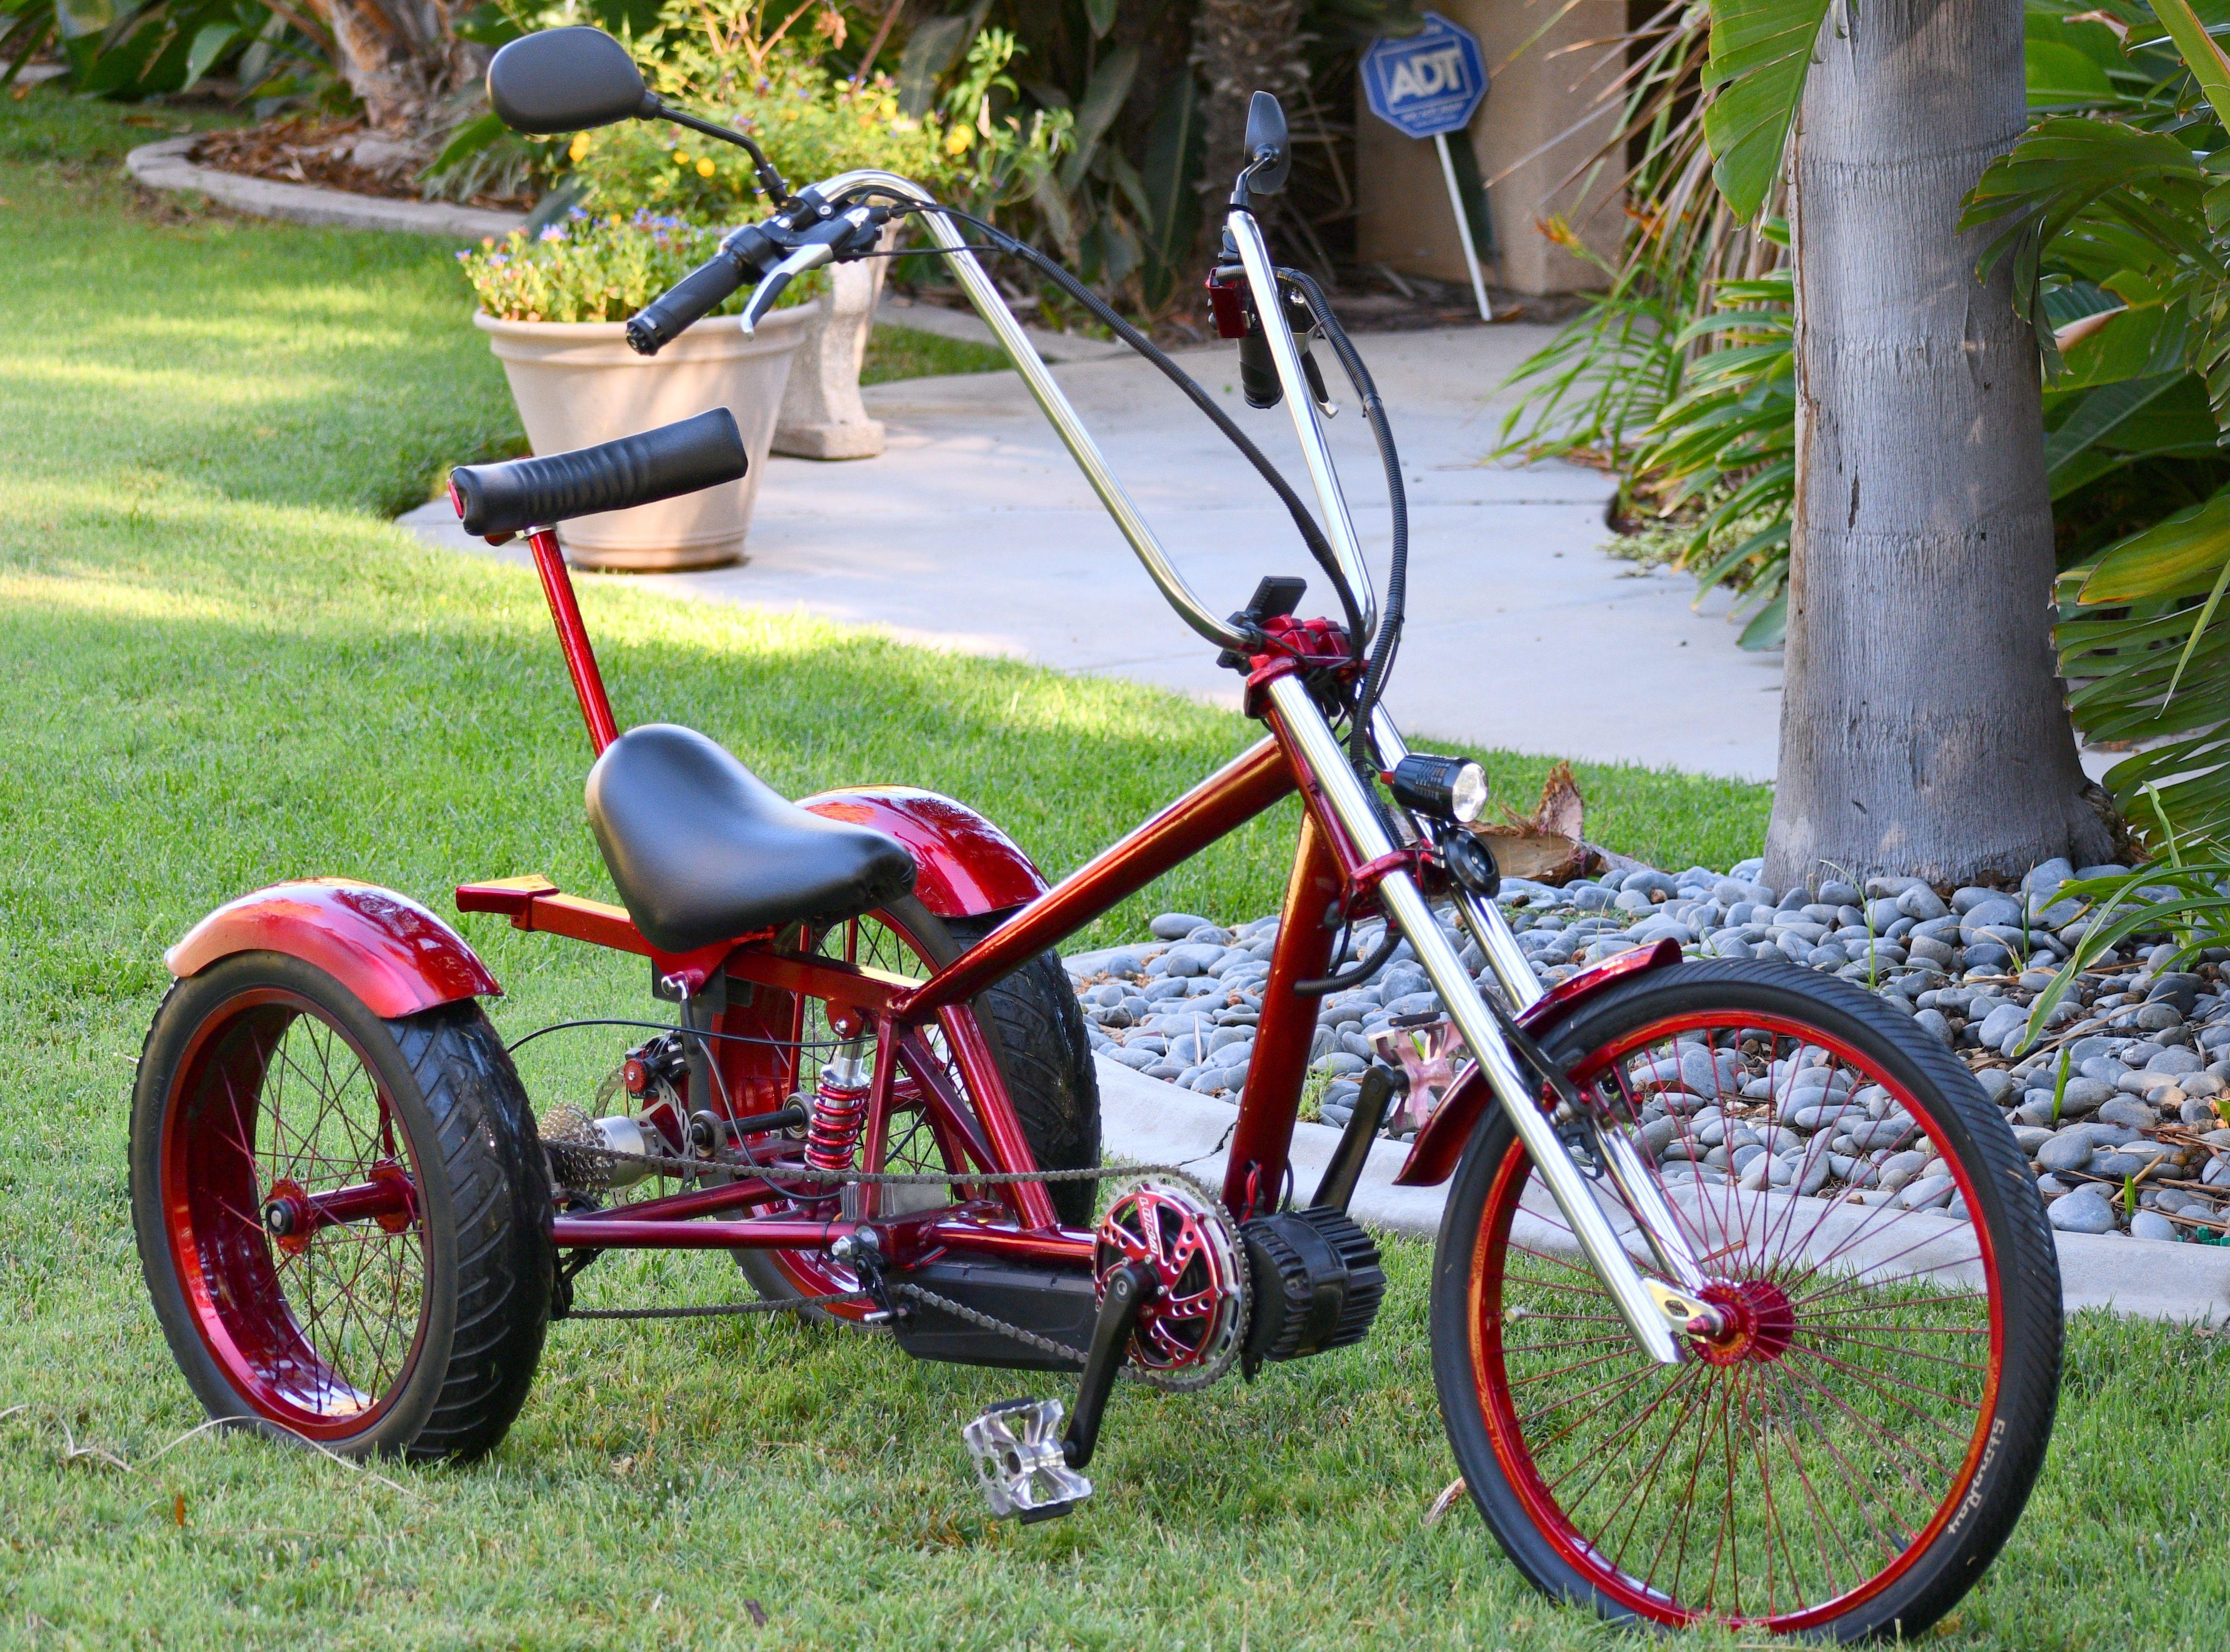 Trike By J Schrader Lowrider Bike Tricycle Bike Trike Bicycle